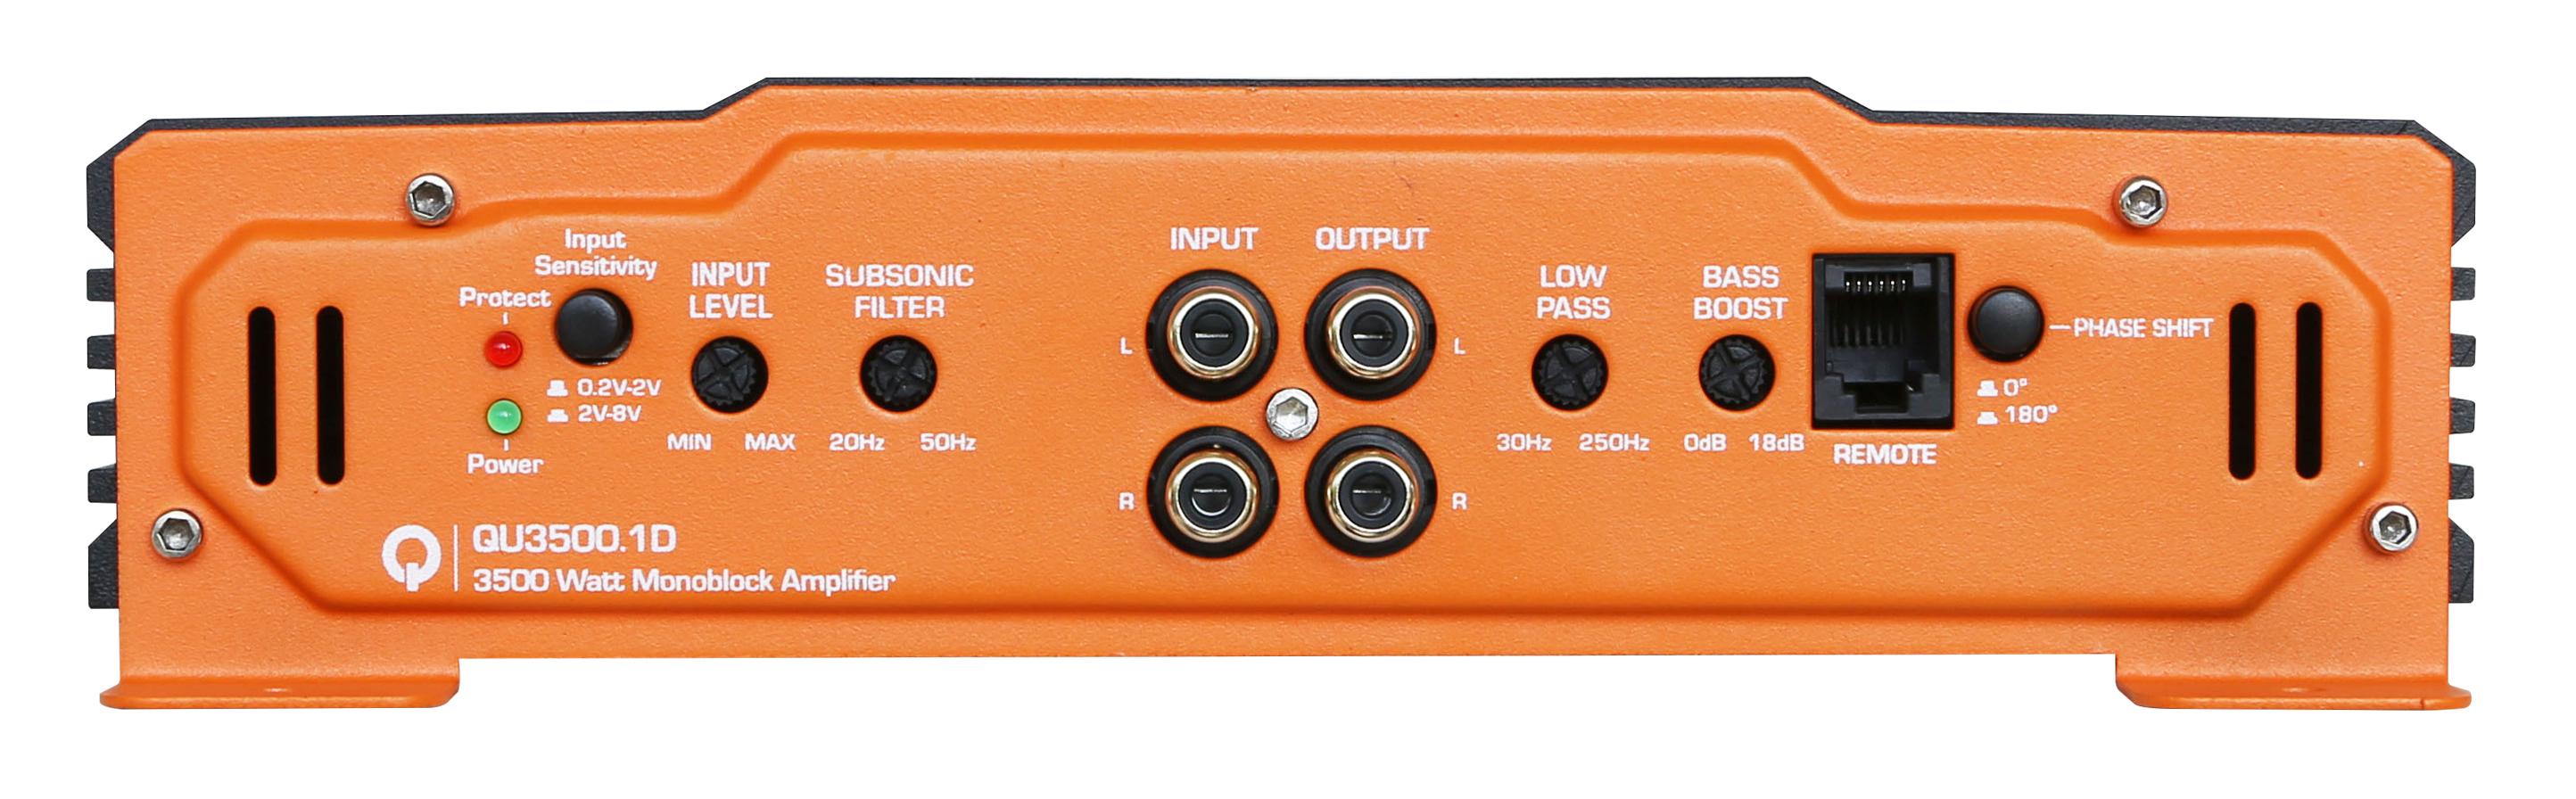 QU3500 1D - Class D Monoblock Amplifier - 3500W